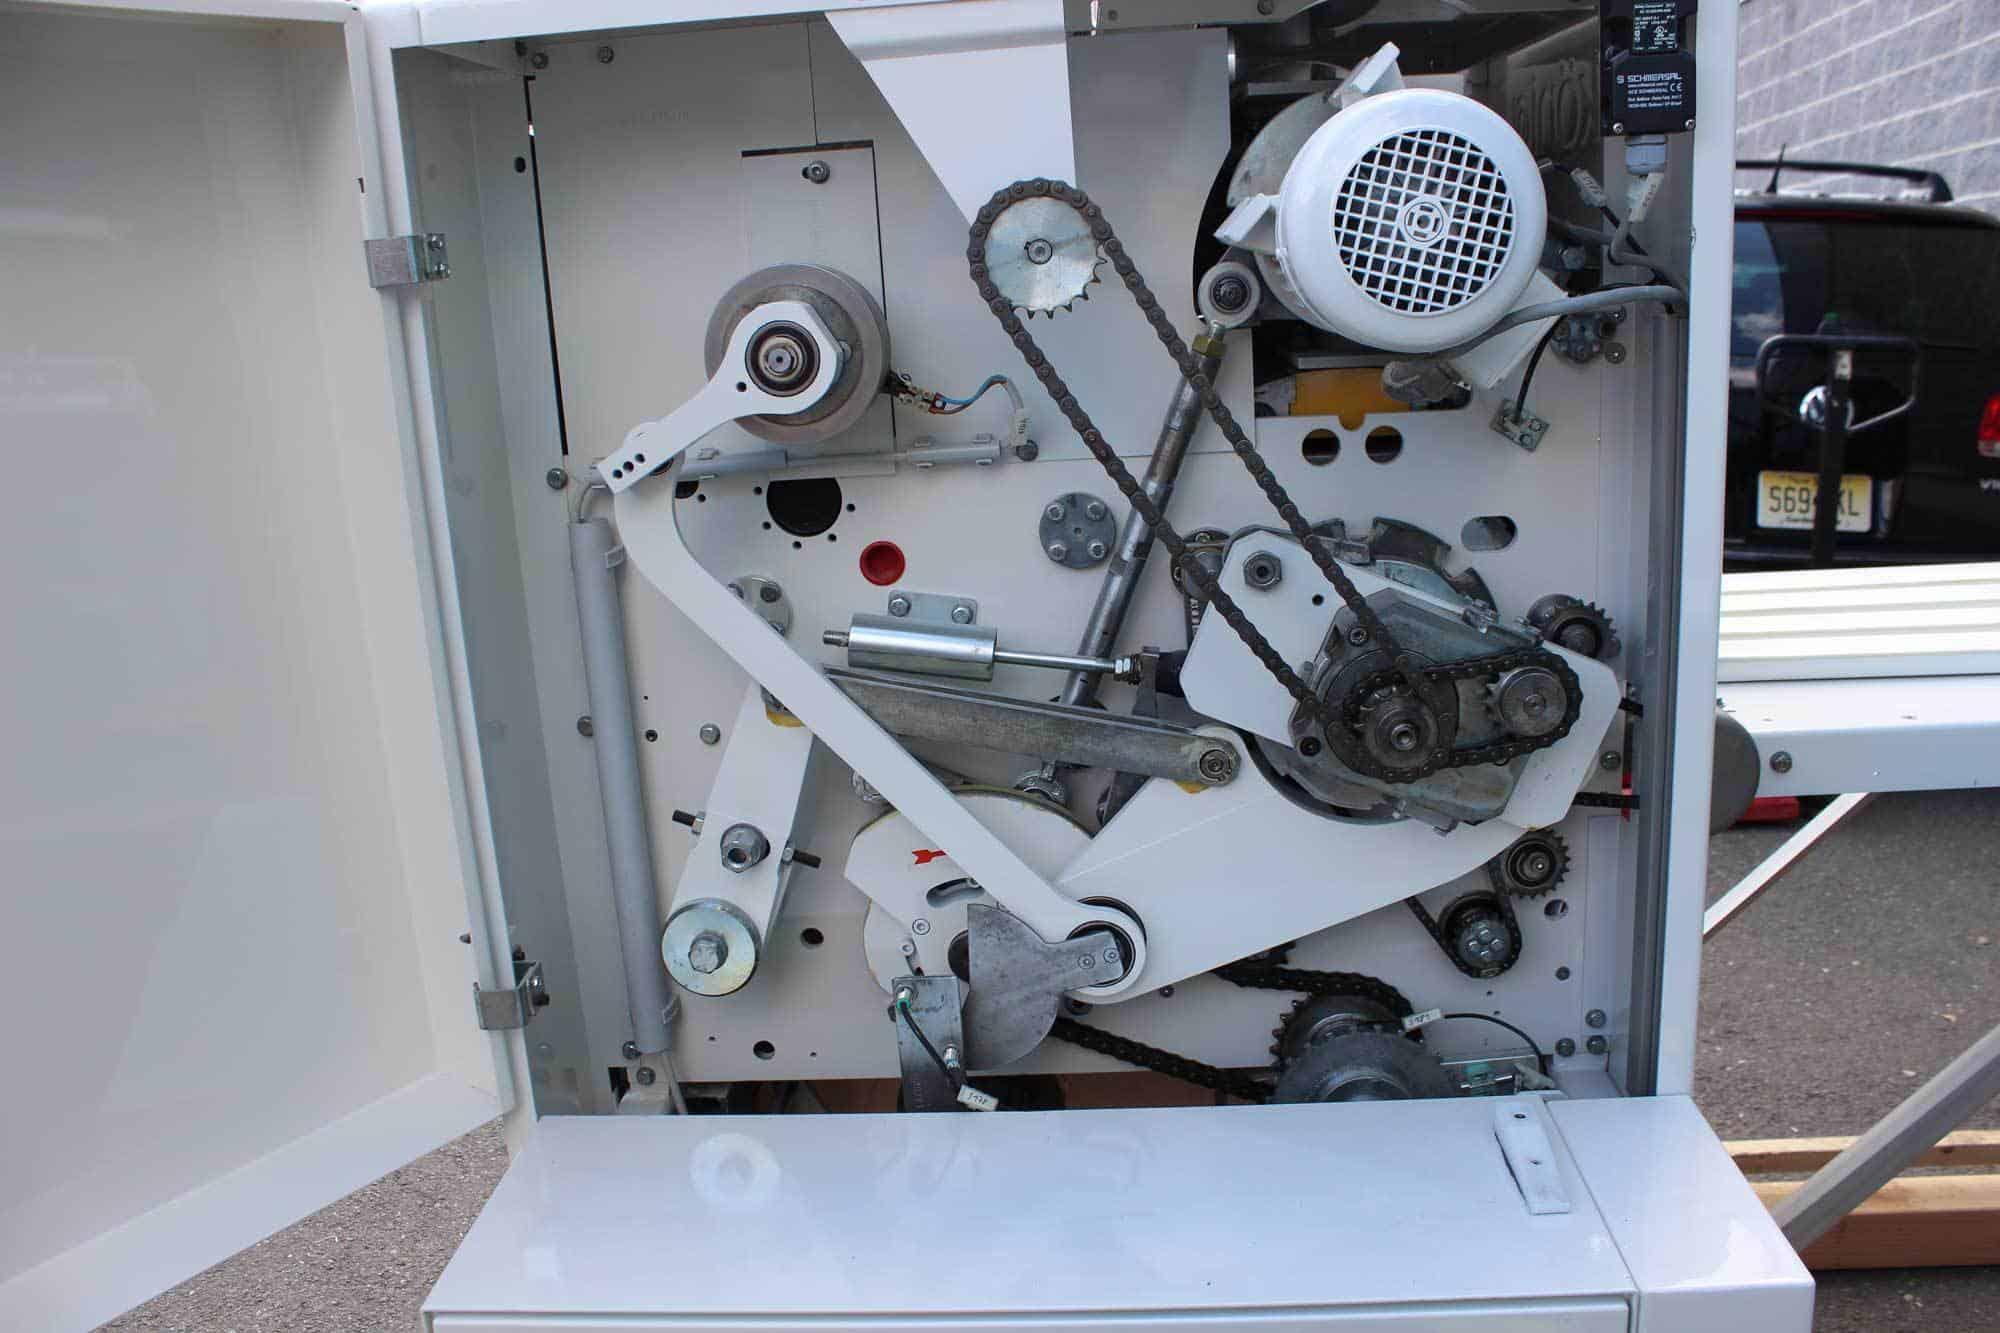 Konig-Futura-Gears-and-Motor-CU